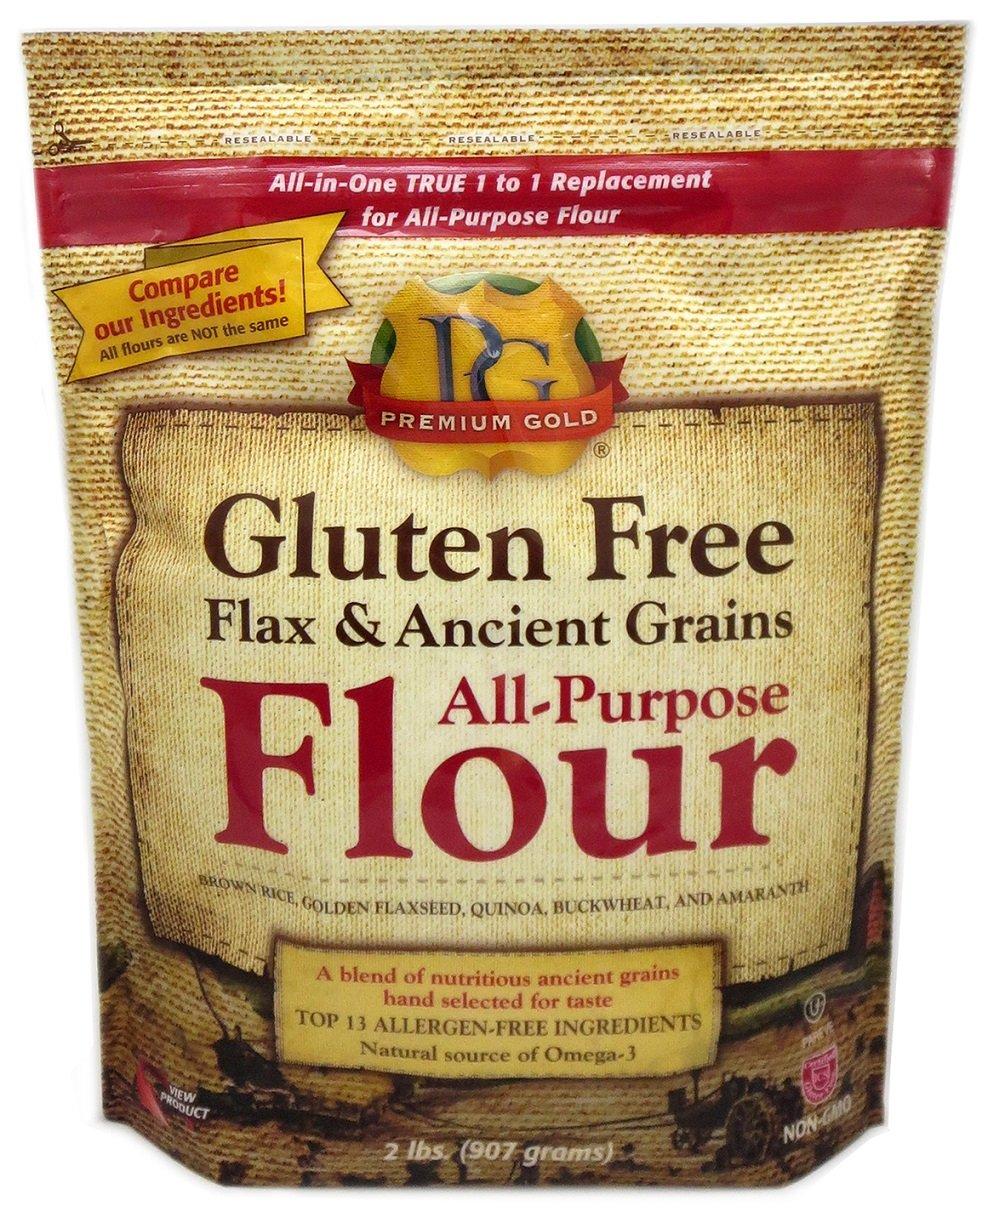 Amazon.com : Premium Gold Gluten Free Pancake and Waffle